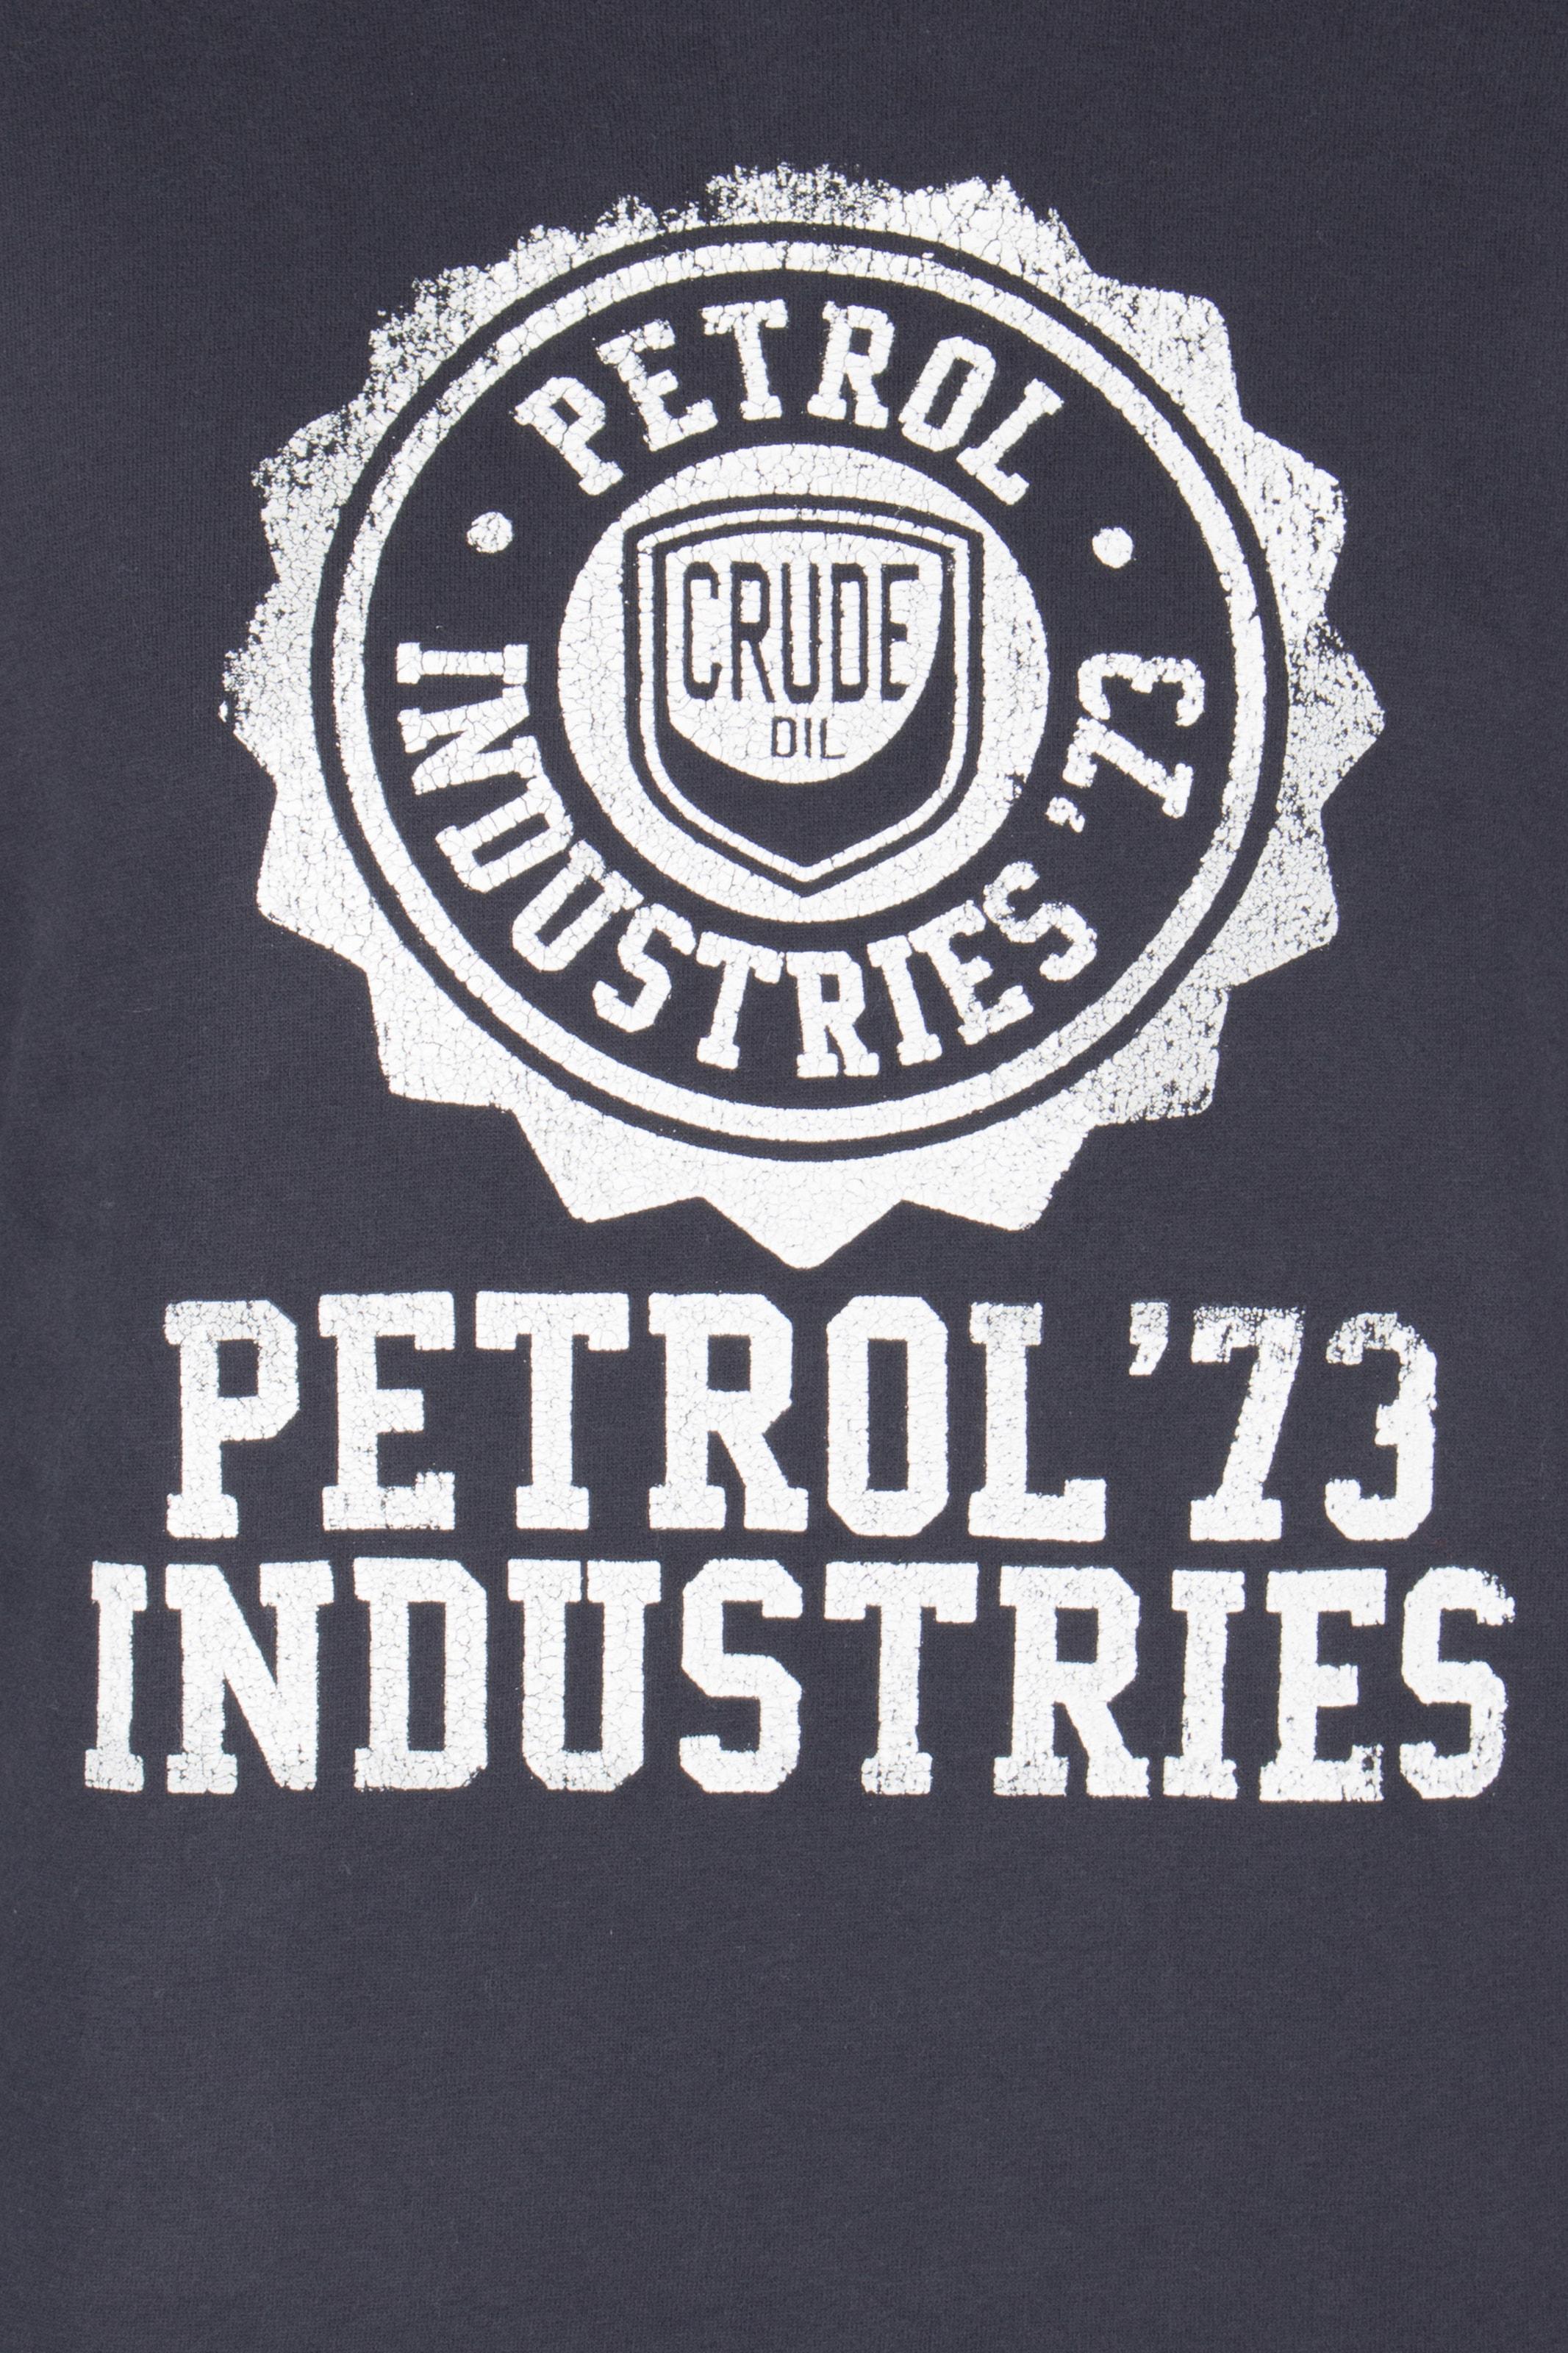 Petrol Industries Petrol Industries Pullover Spielraum Besten amaeTxCIc